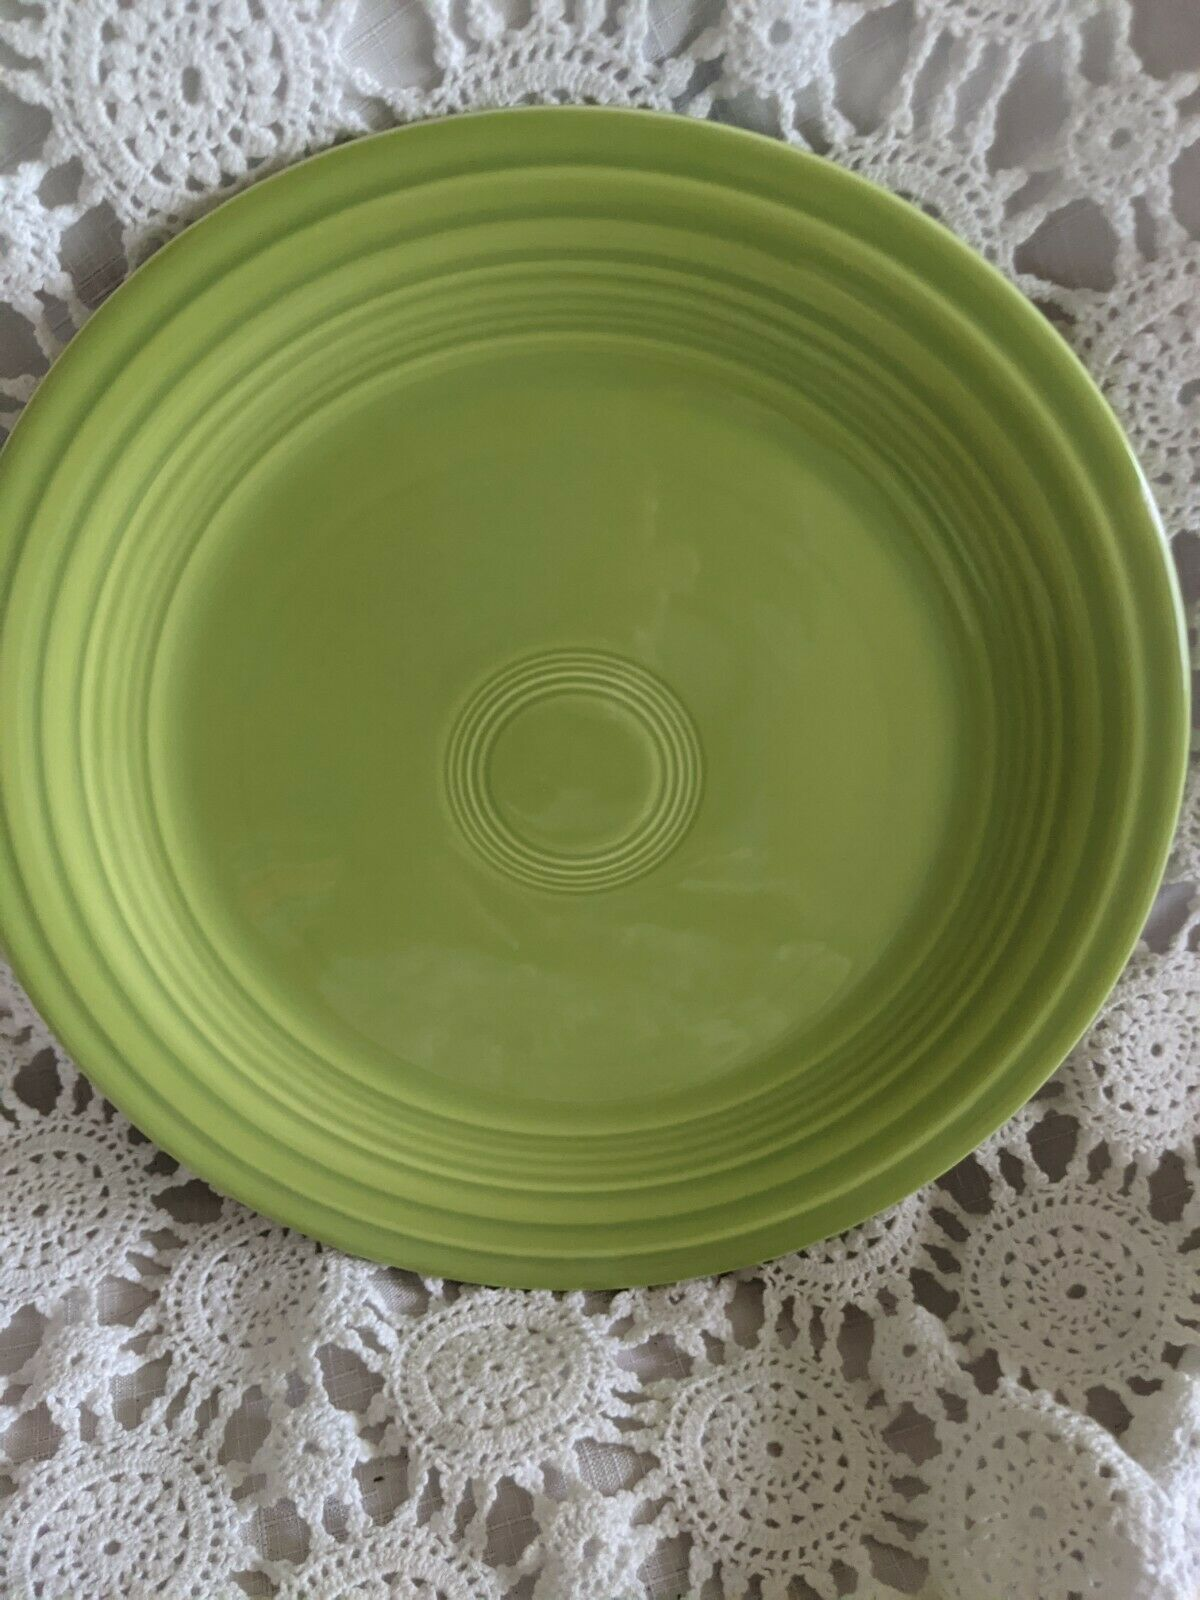 Genuine Fiesta Dinner Plate 9.5 Light Olive Green Vintage Made USA - $14.54